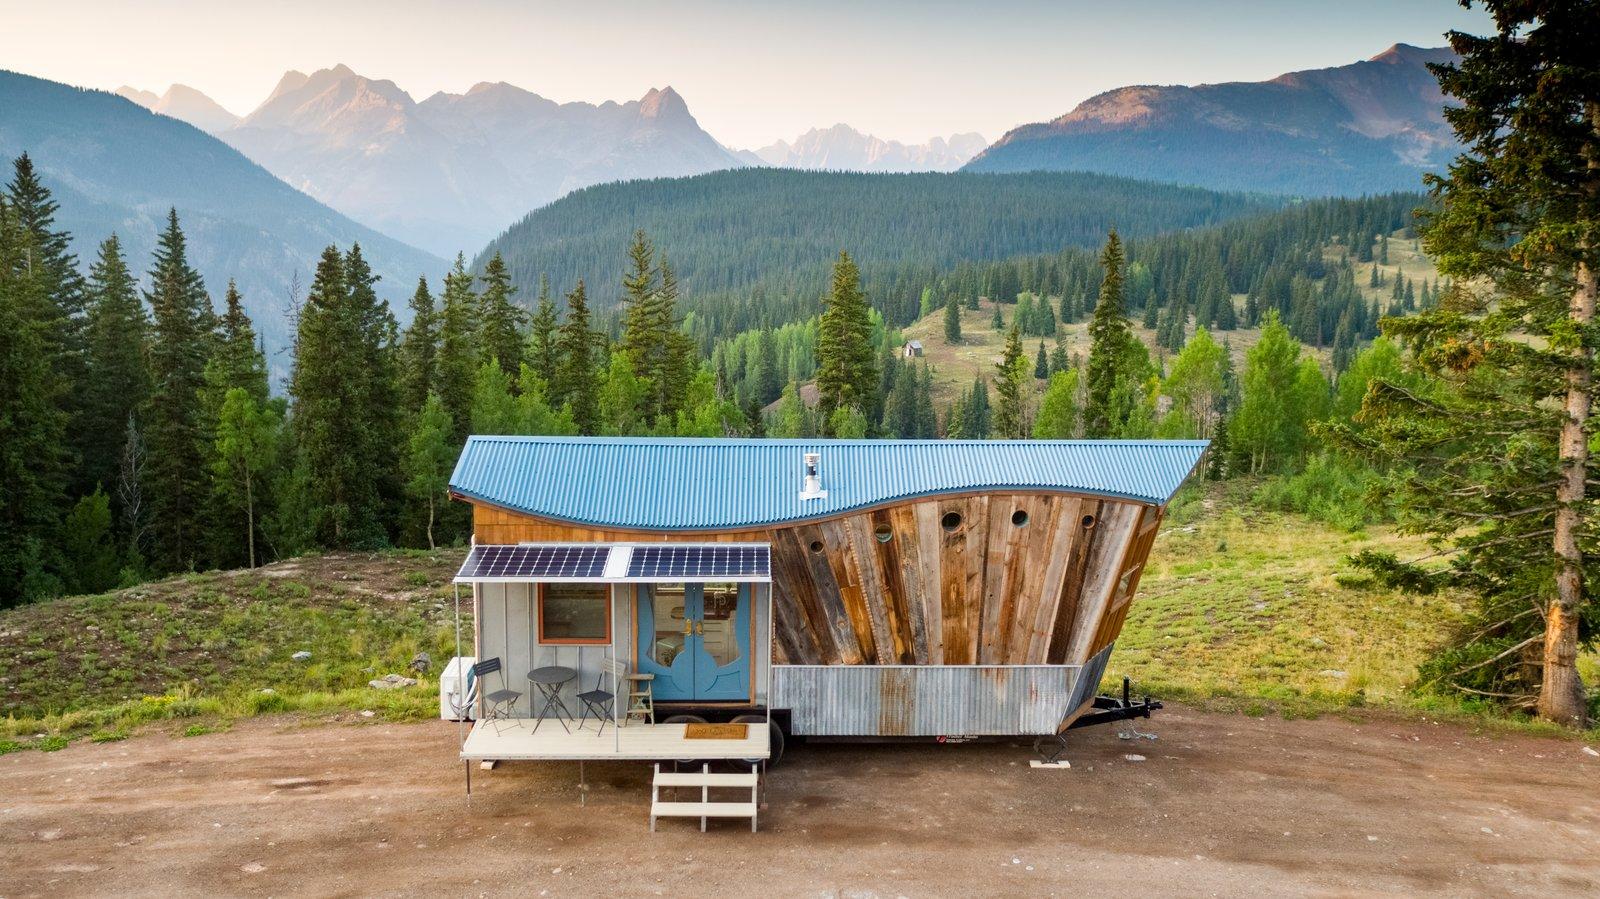 San Juan Tiny House by Rocky Mountain Tiny Houses - Dwell